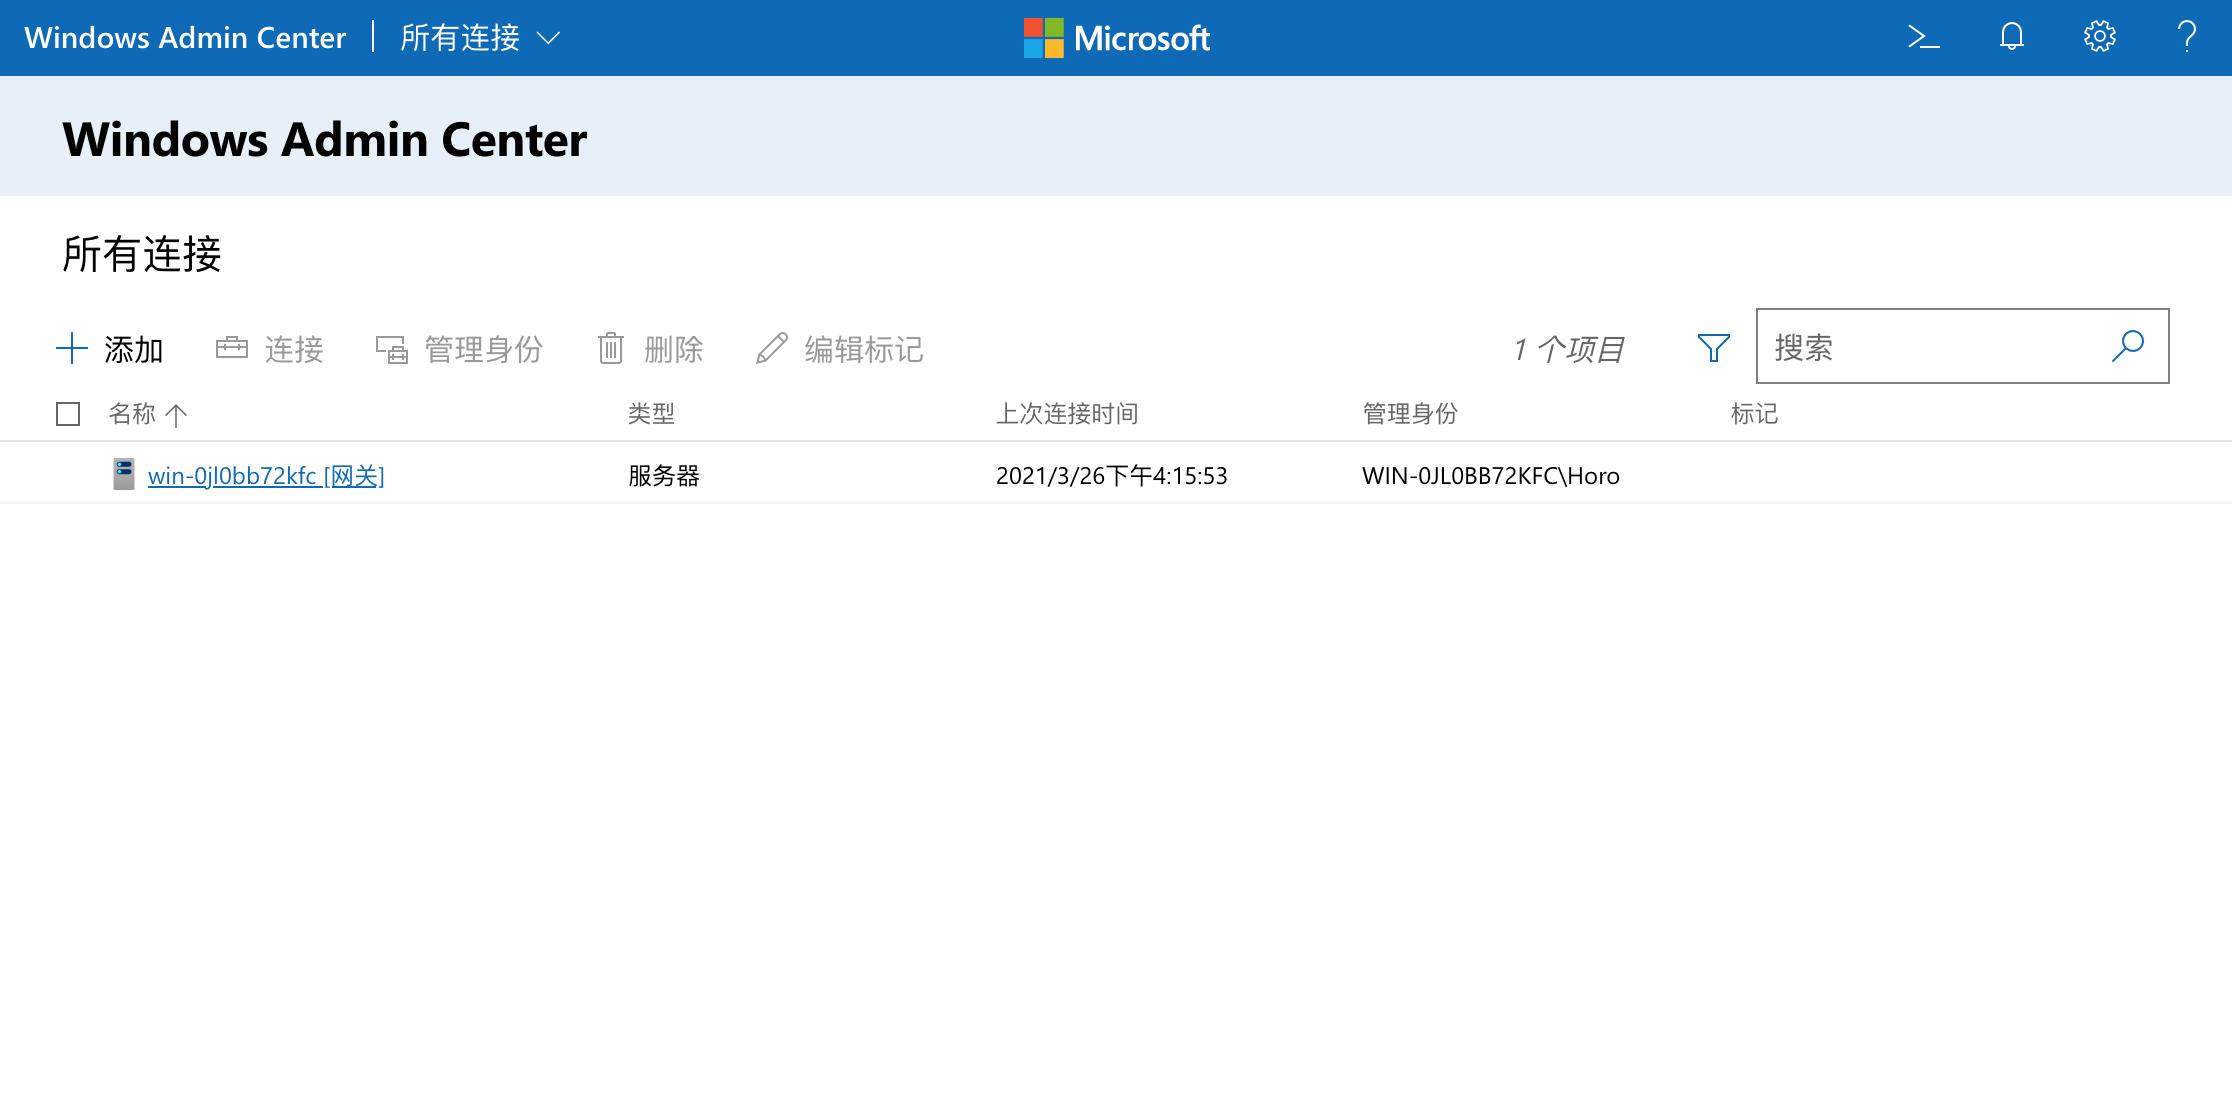 Windows Admin Center 的主界面